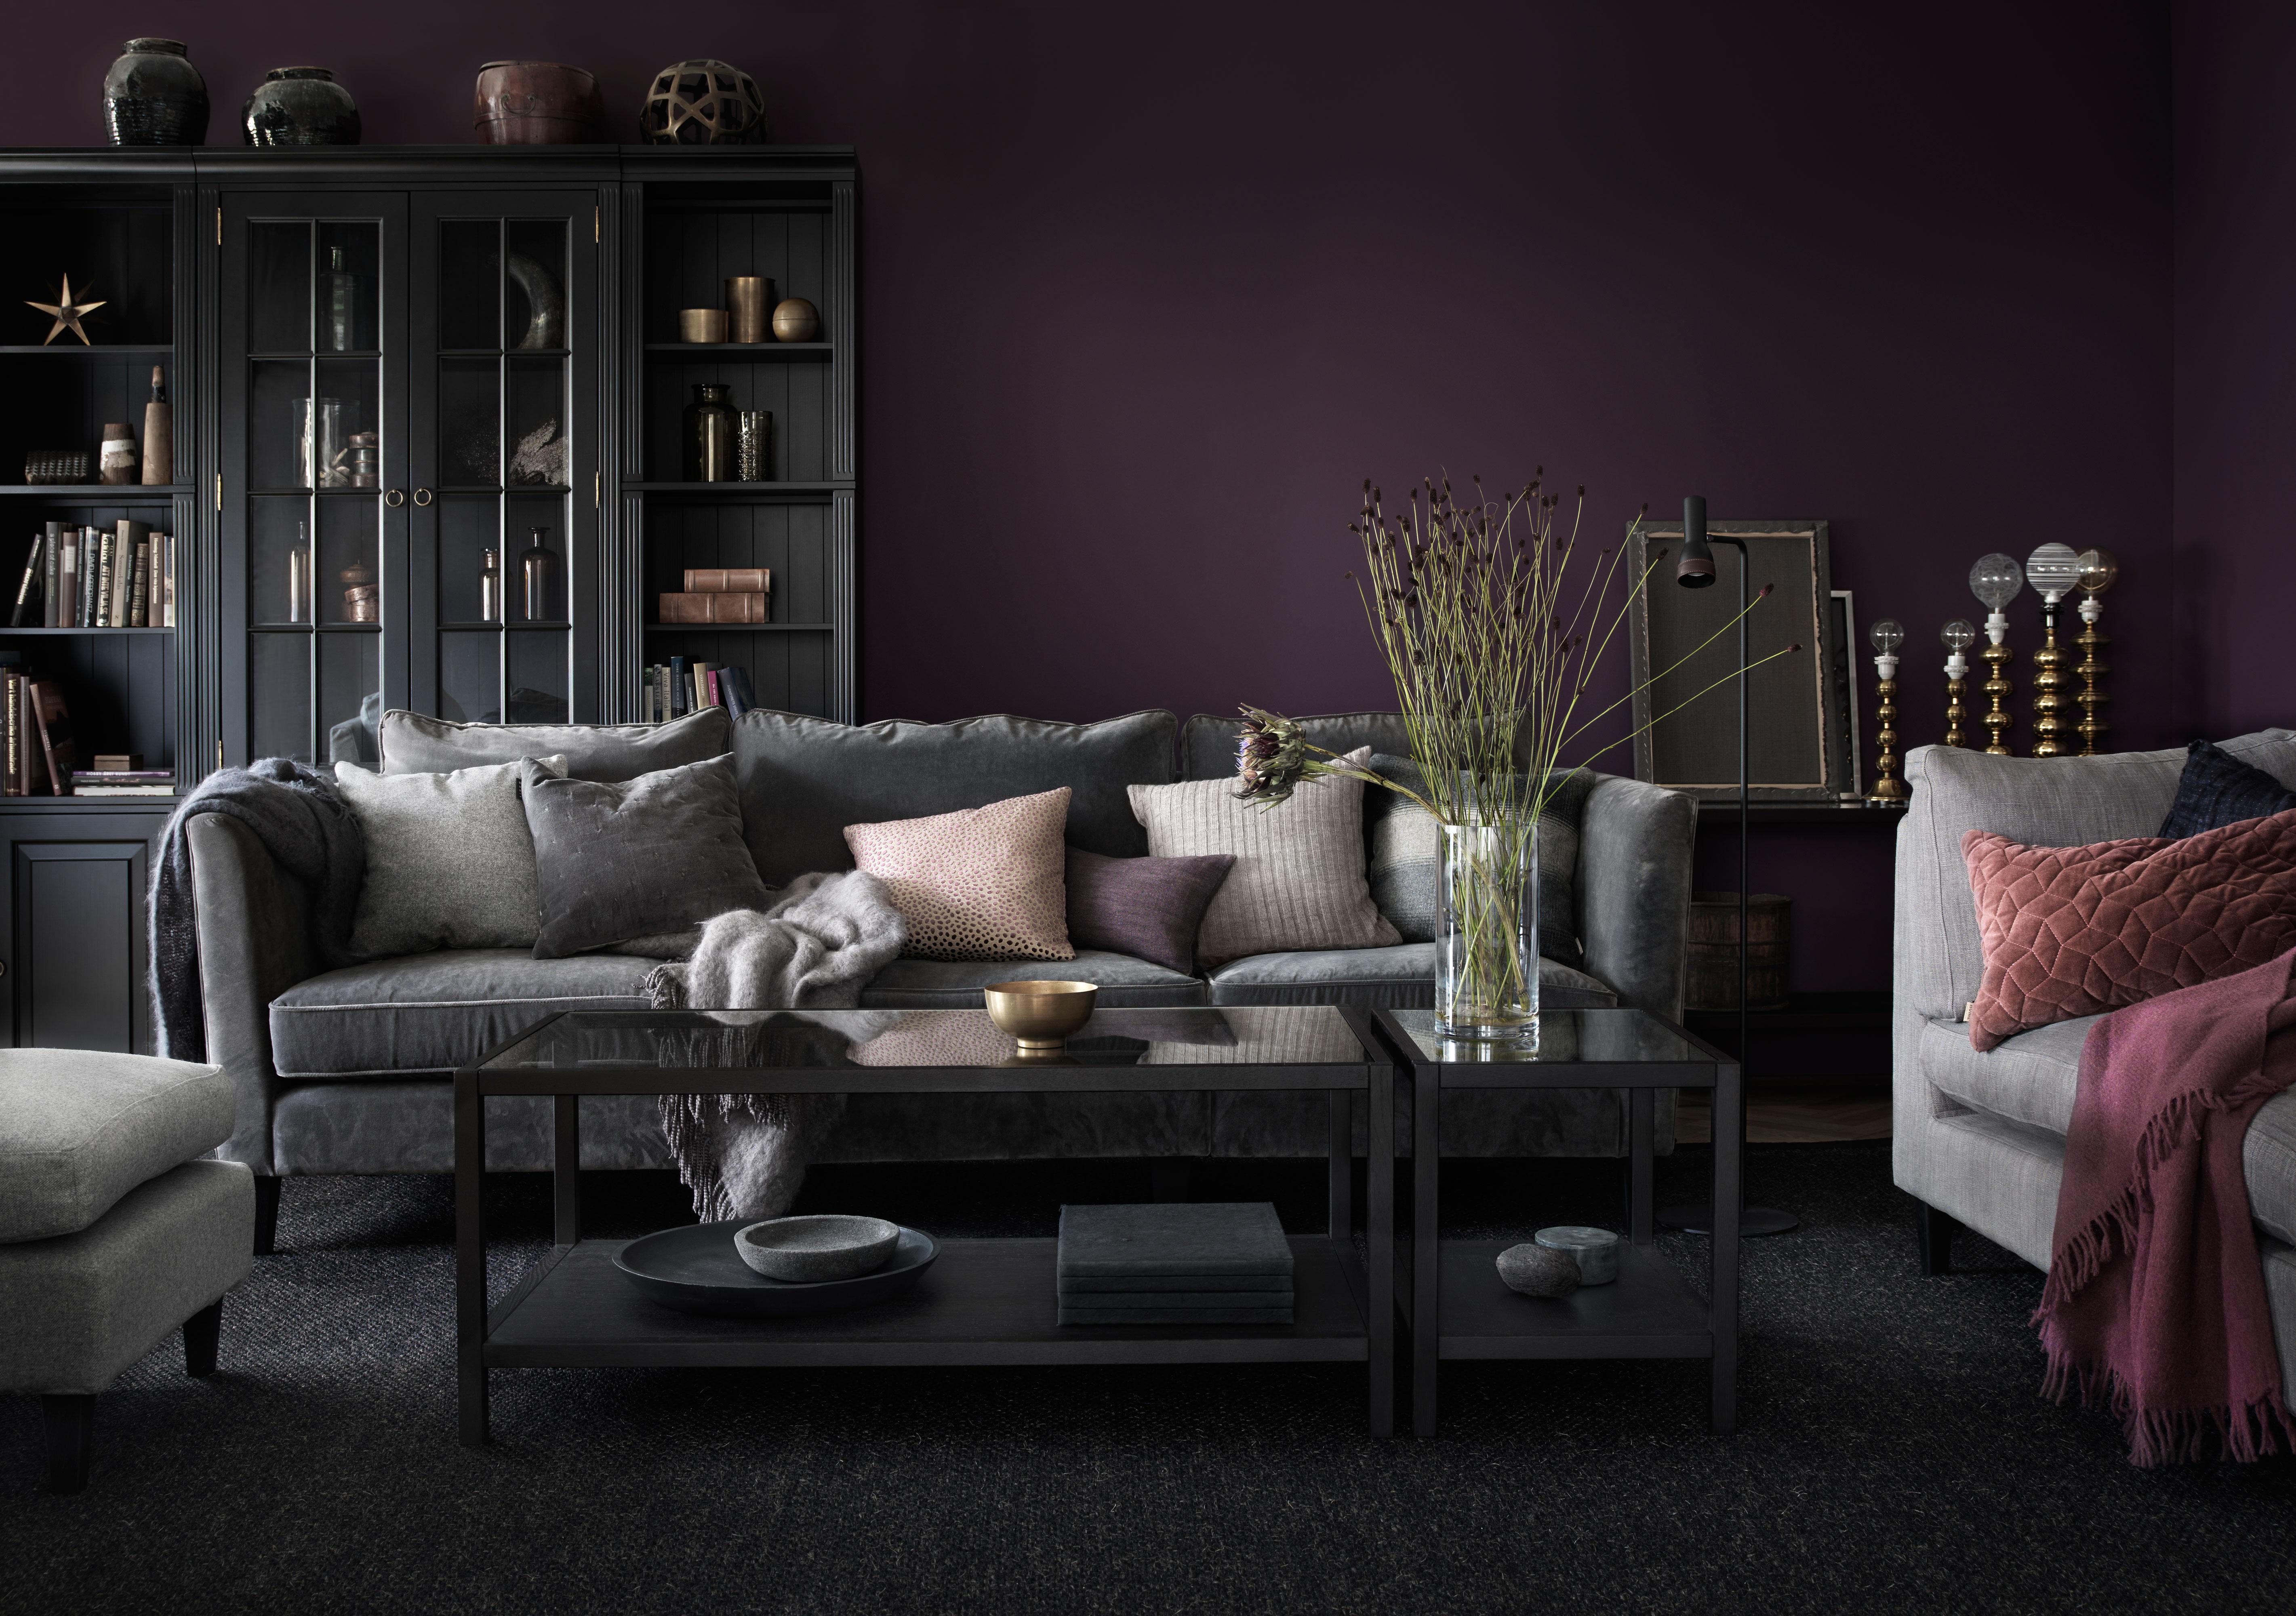 Carlton Soffa 3-sits i grått, soffbord 2000, svart bokylla Stockholm - englesson.se